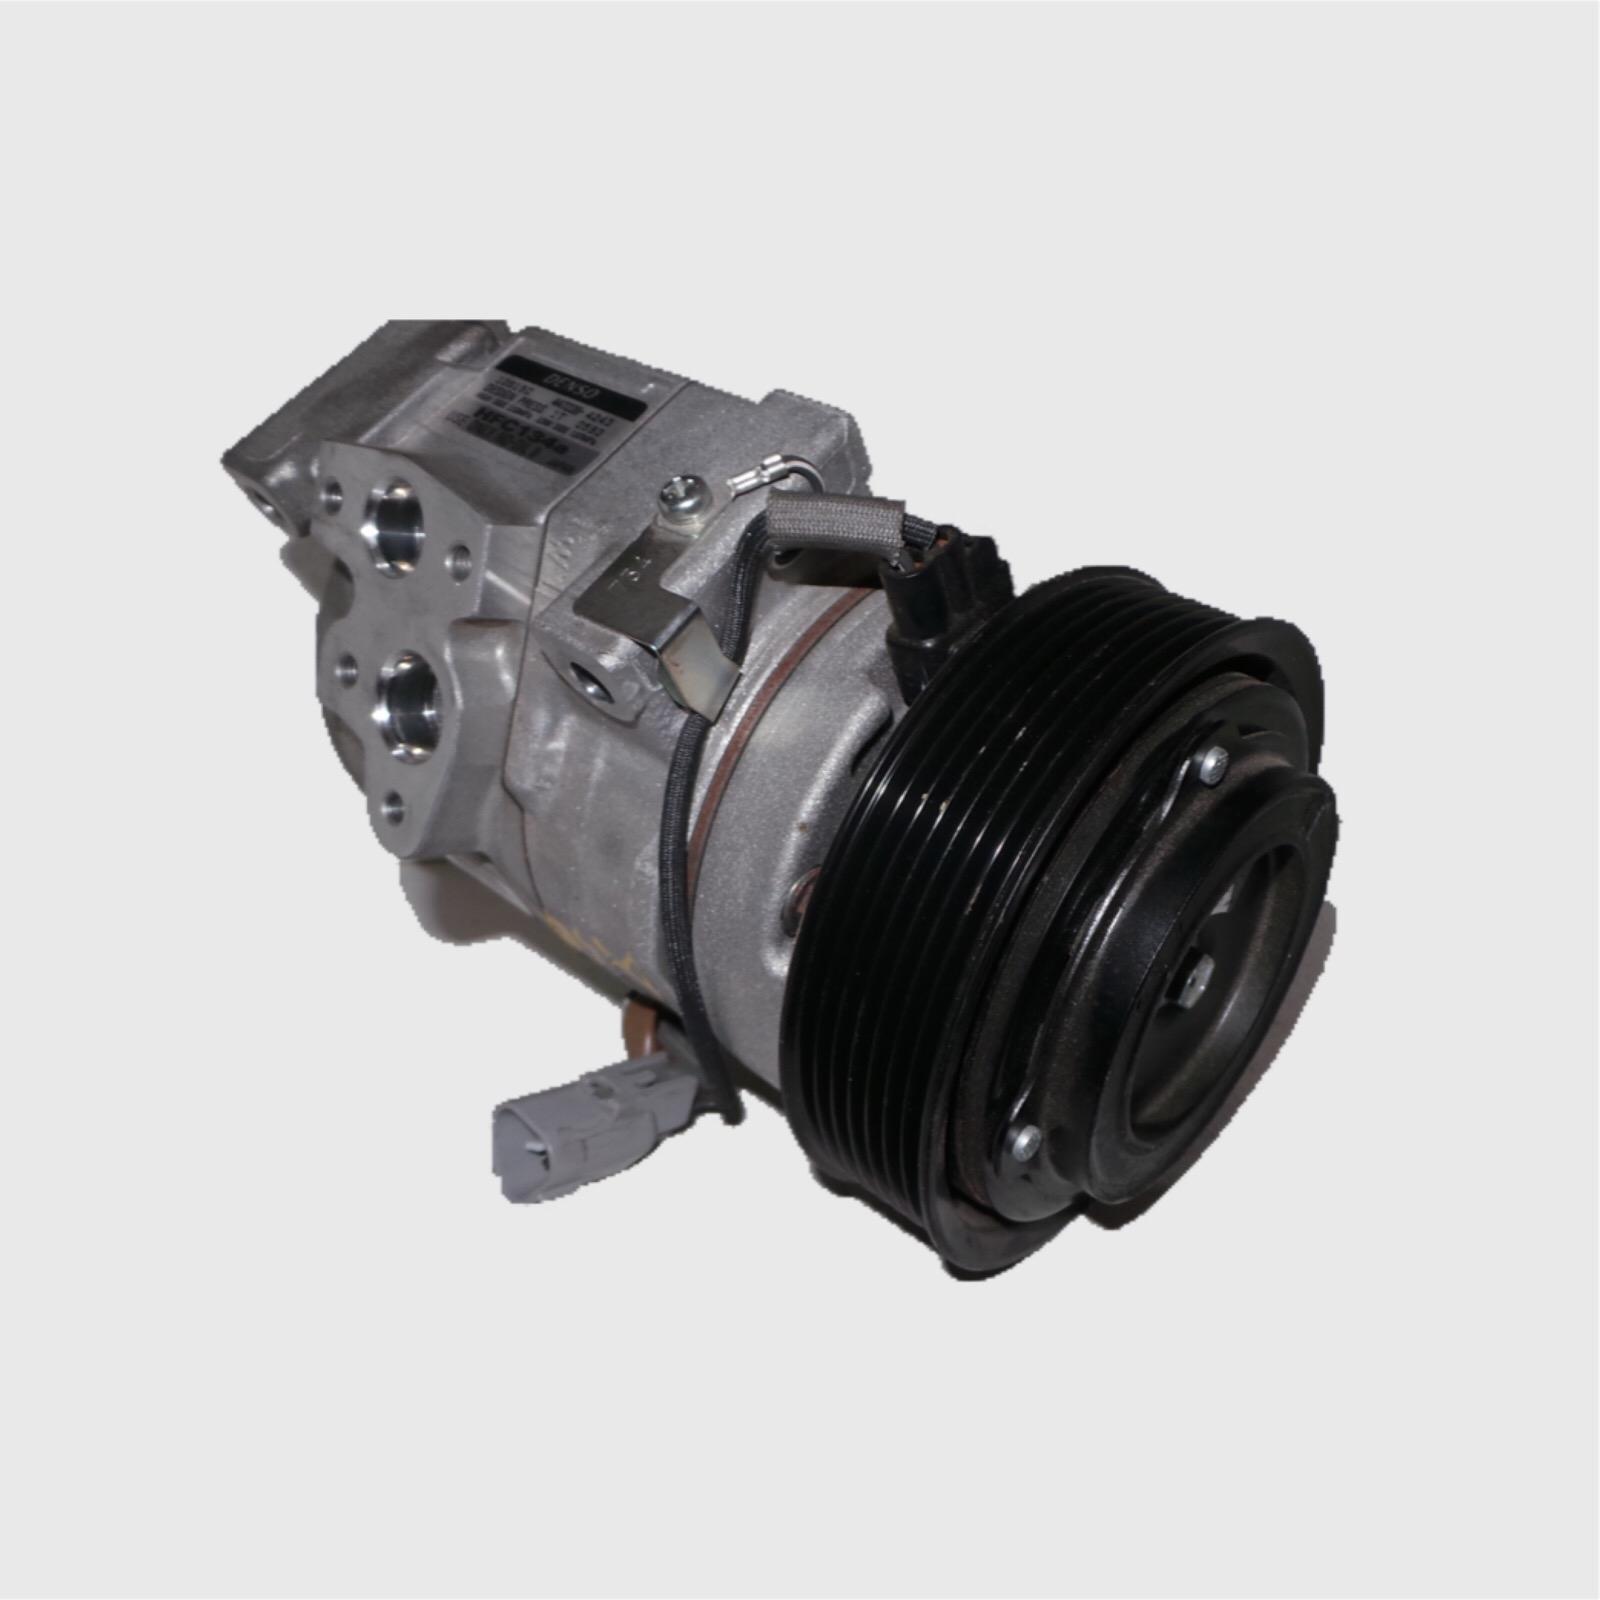 TOYOTA HIACE, A/C Compressor, KDH, 3.0, 1KD-FTV, DIESEL, 10S17C TYPE, 09/06-